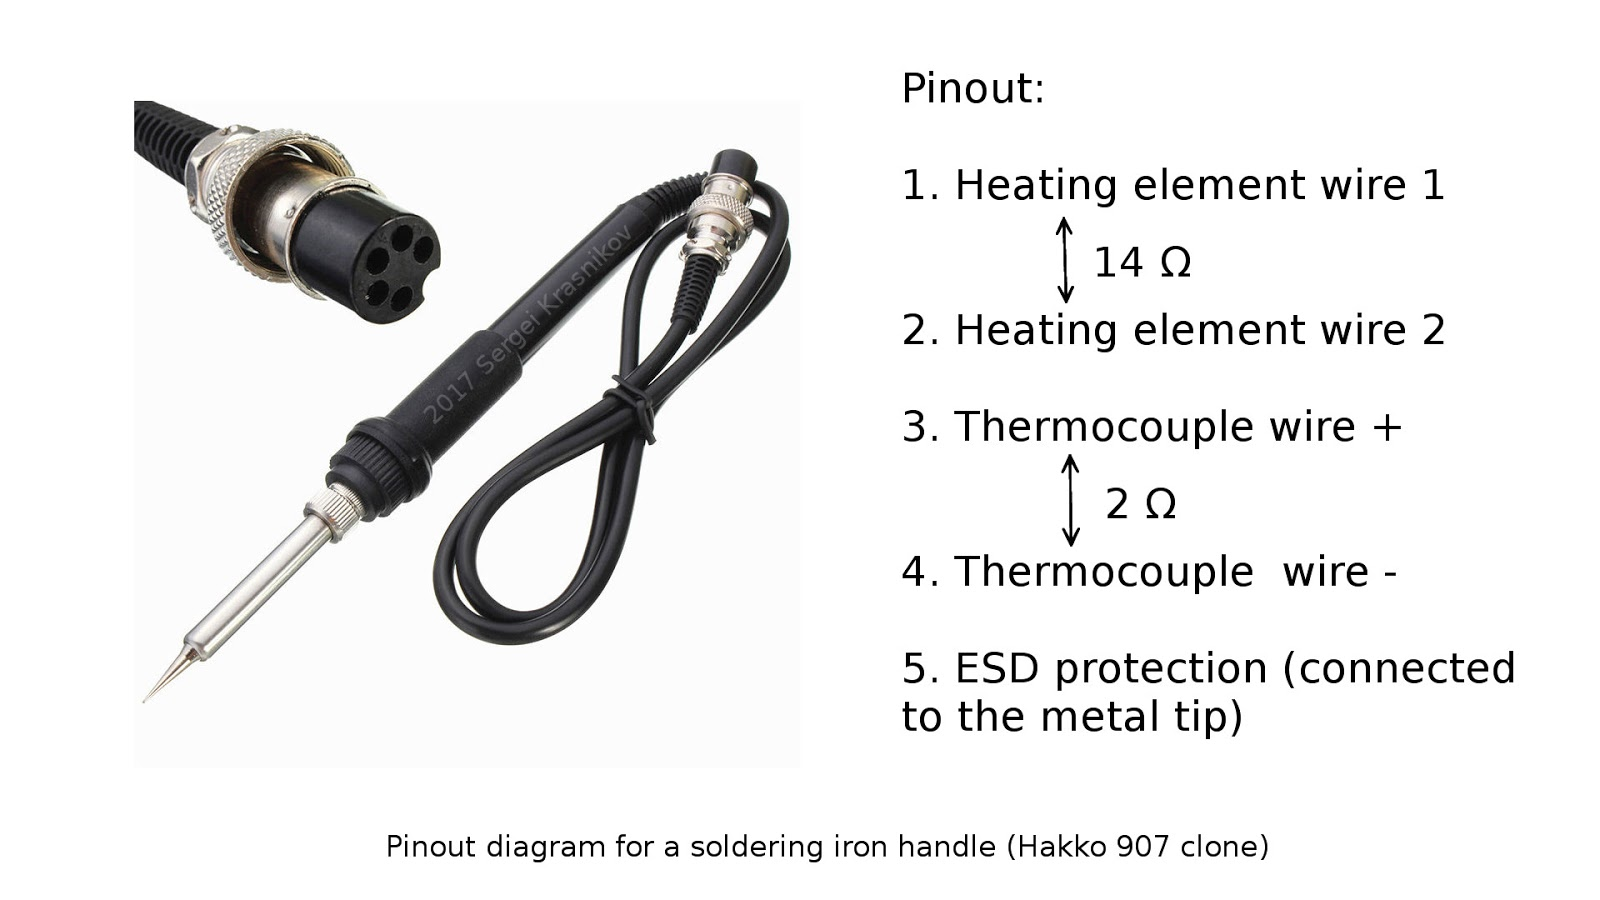 Soldering Iron Wiring Diagram Permanent Split Phase Motor Electrolab Diy De Station For 25